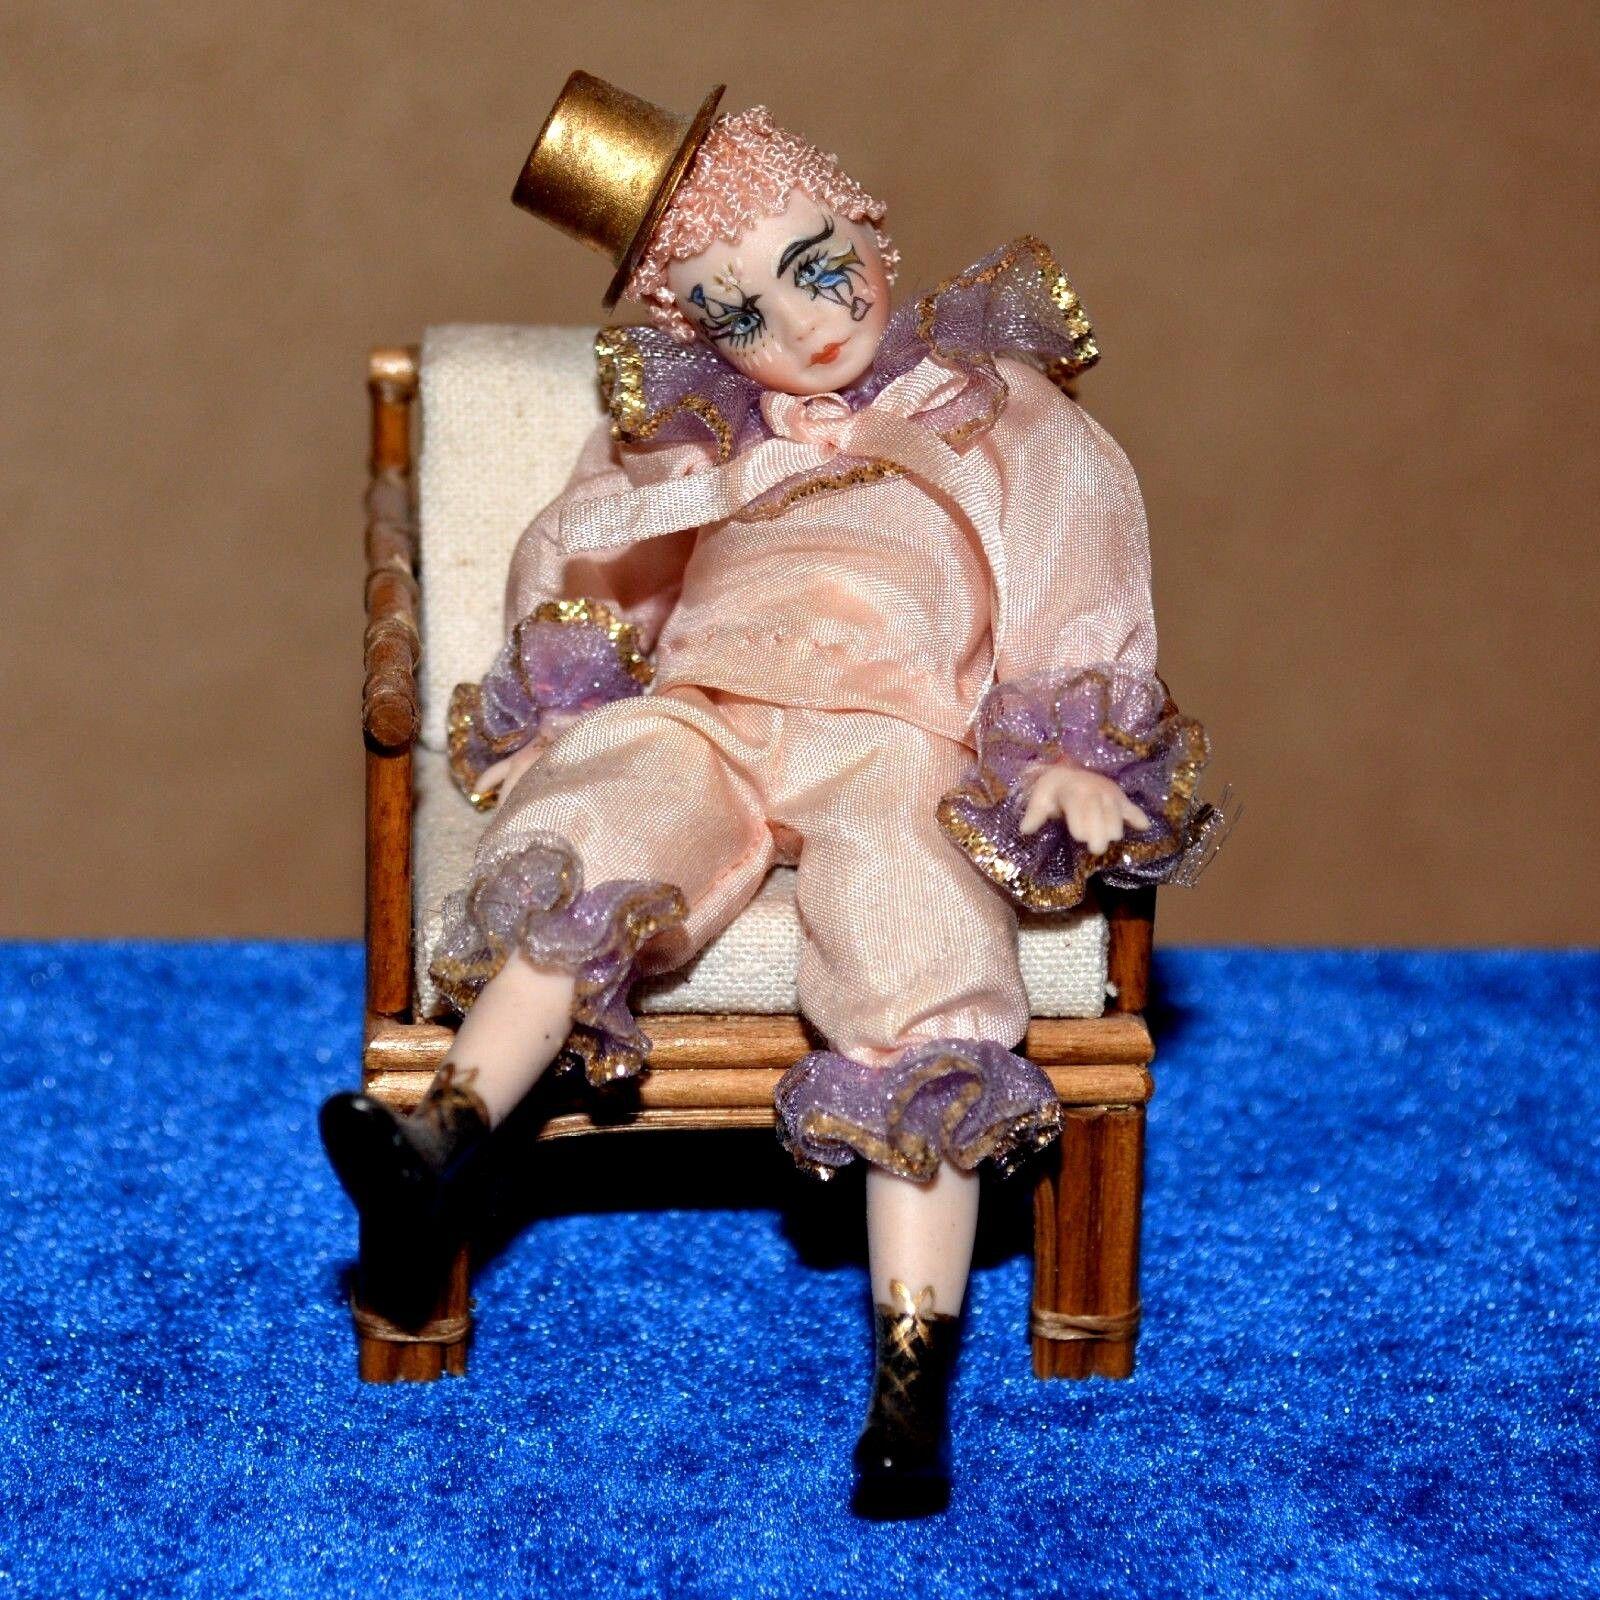 Dollhouse doll miniature porcelain girl 1 12 clown